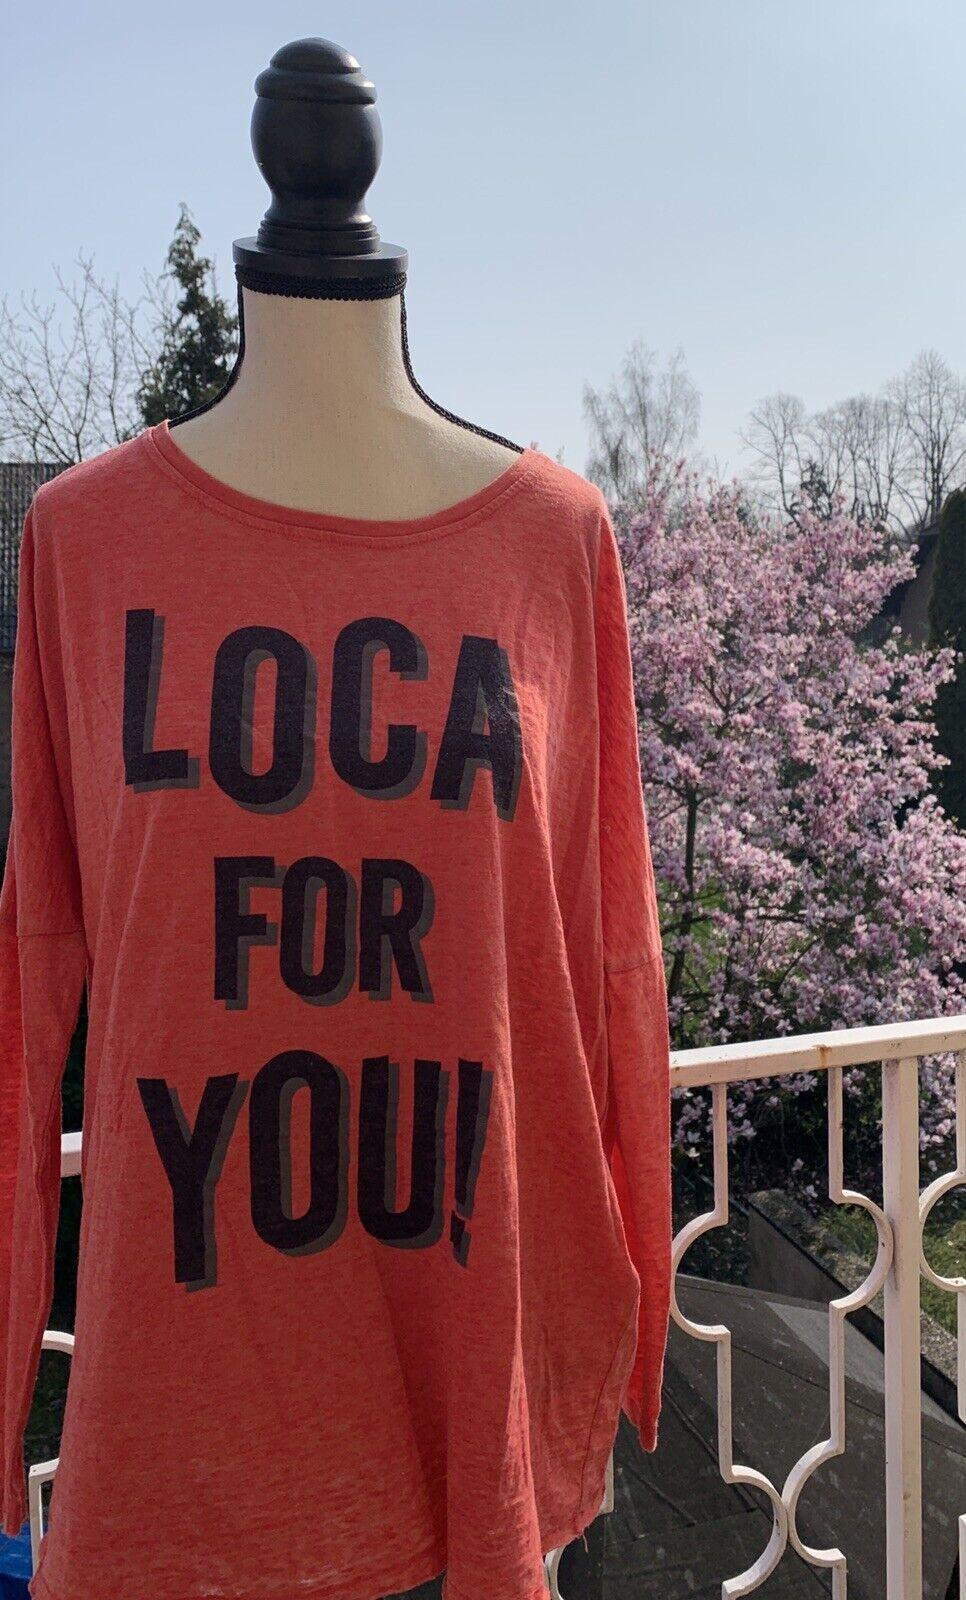 Sweater the hip tee Damen Shirt S M NEU Loca Ibiza Jades 36 38 Rot